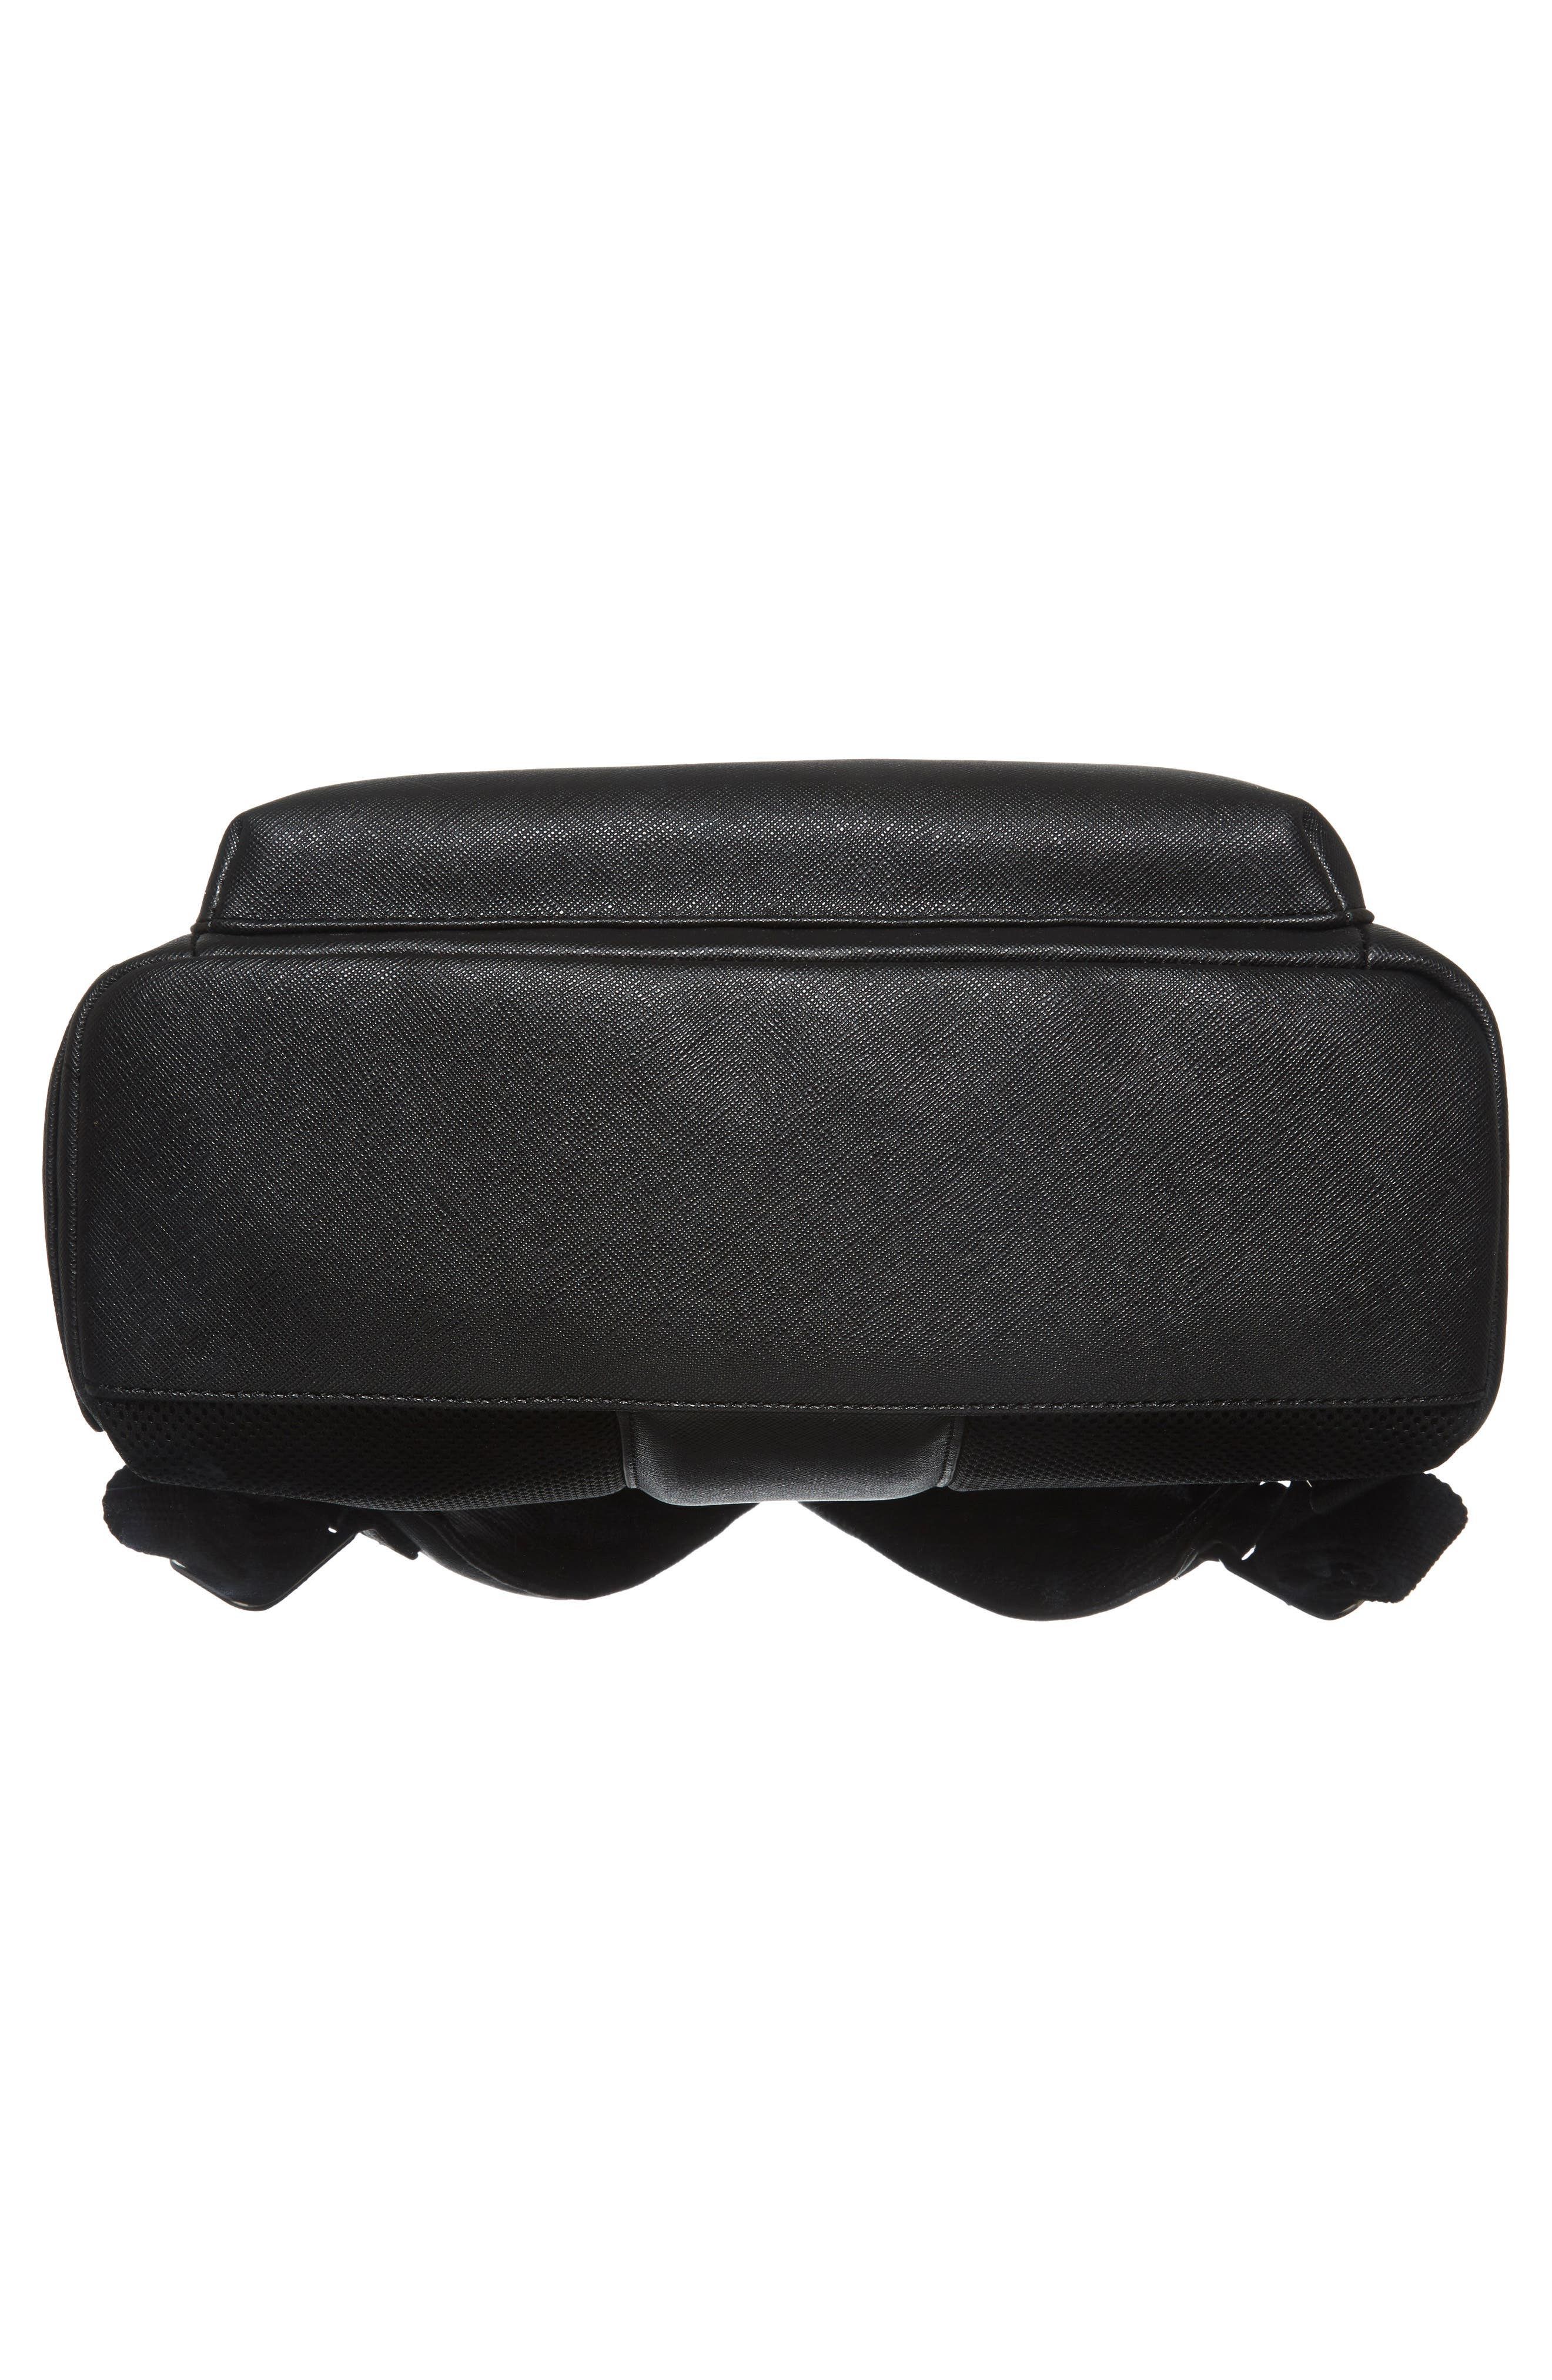 Fangs Backpack,                             Alternate thumbnail 6, color,                             Black